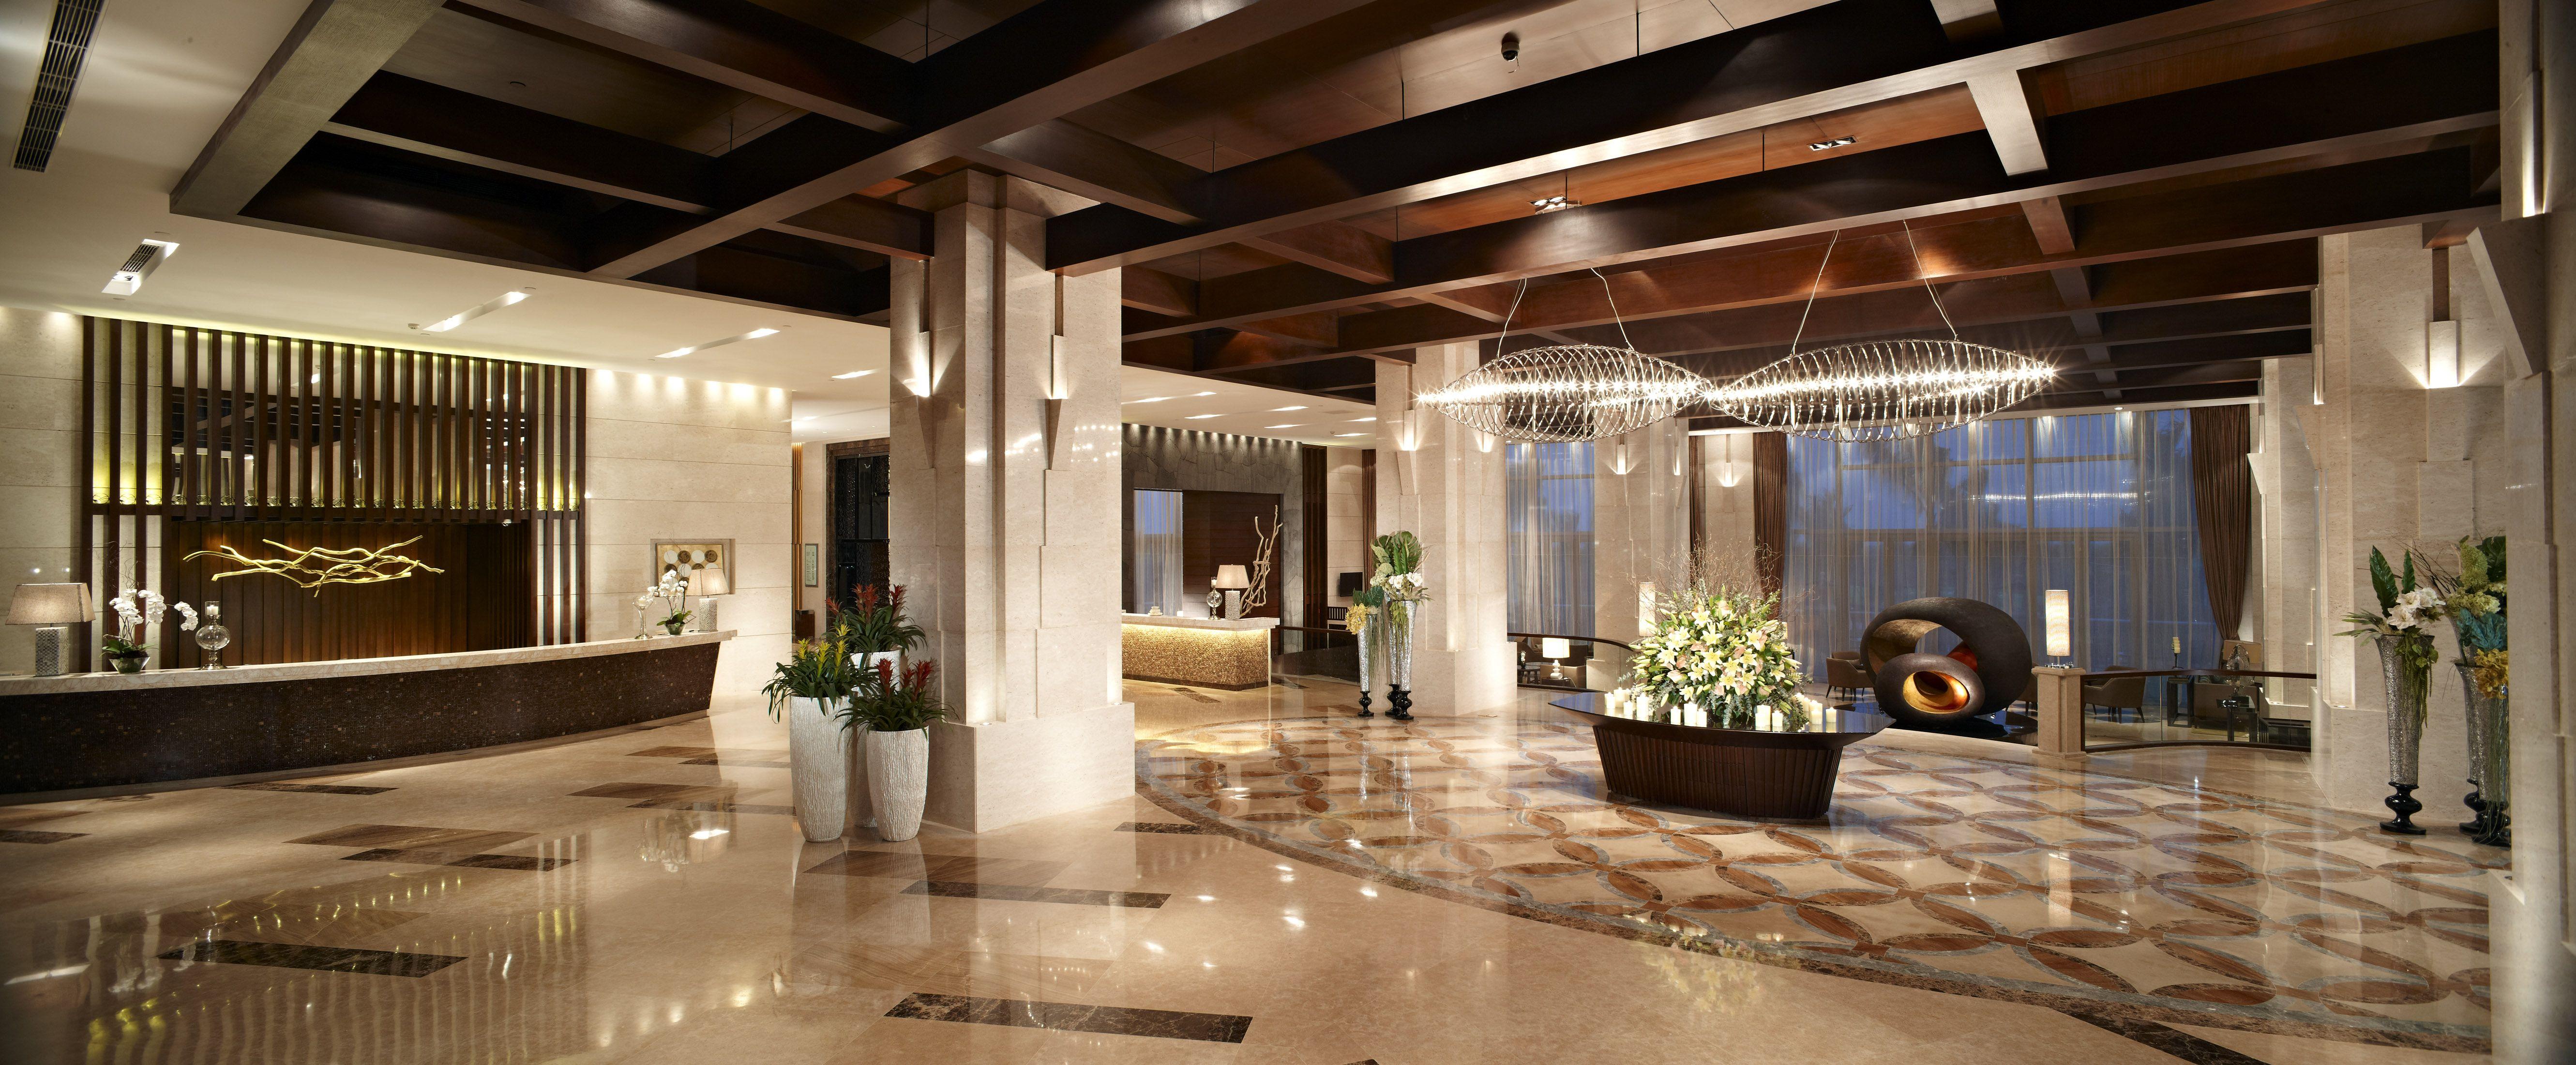 Hotel Lobby Wm 1 Jpg 5323 2200 Hotel Pinterest